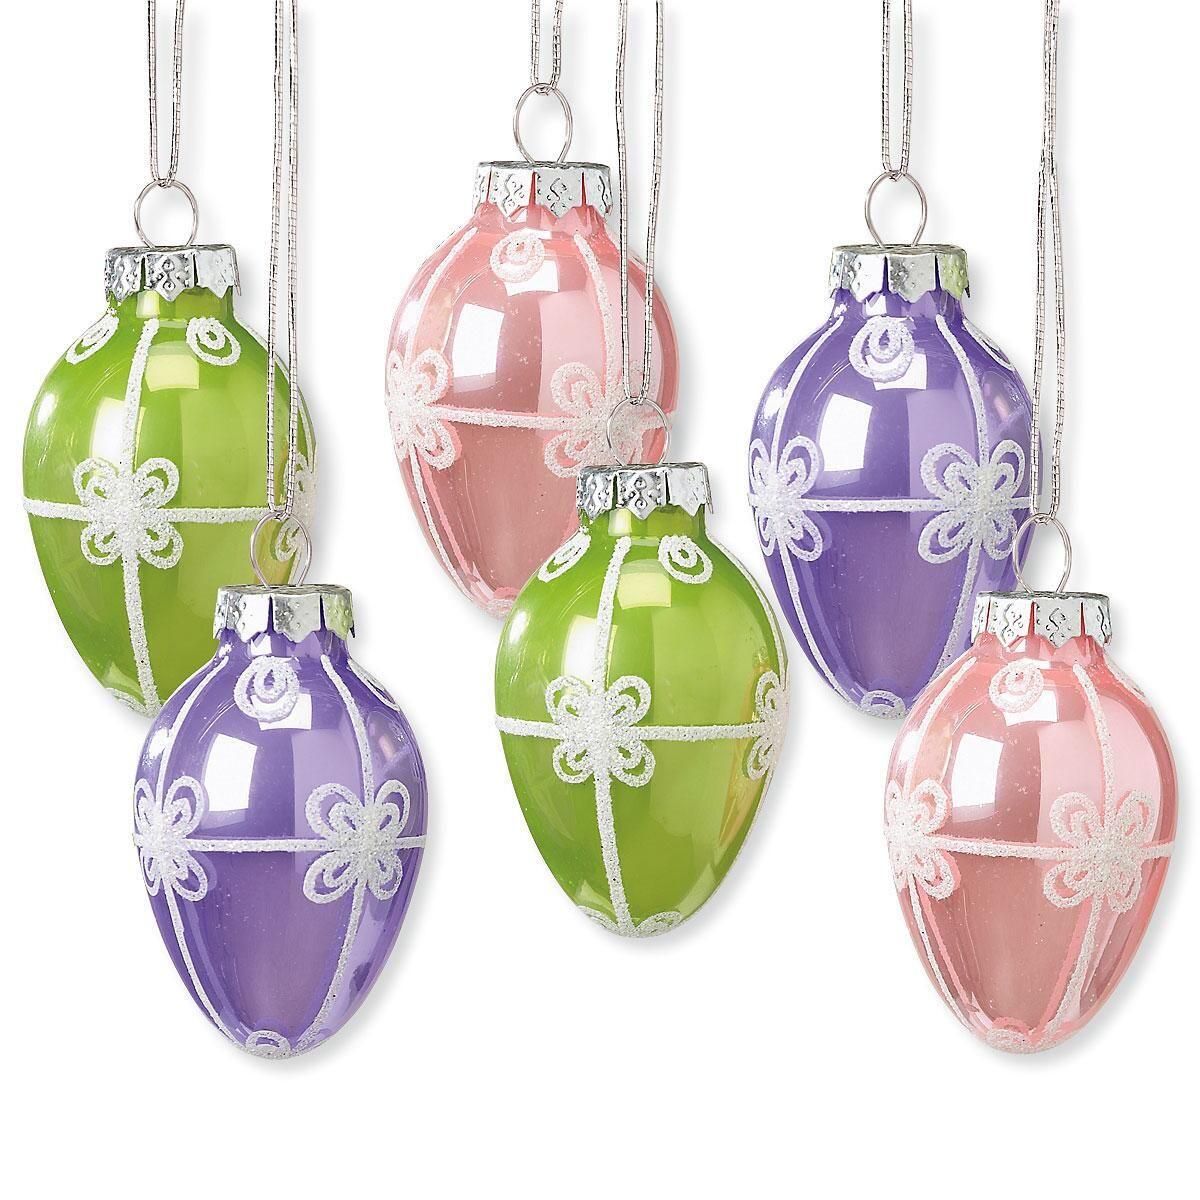 Glass Egg Ornaments